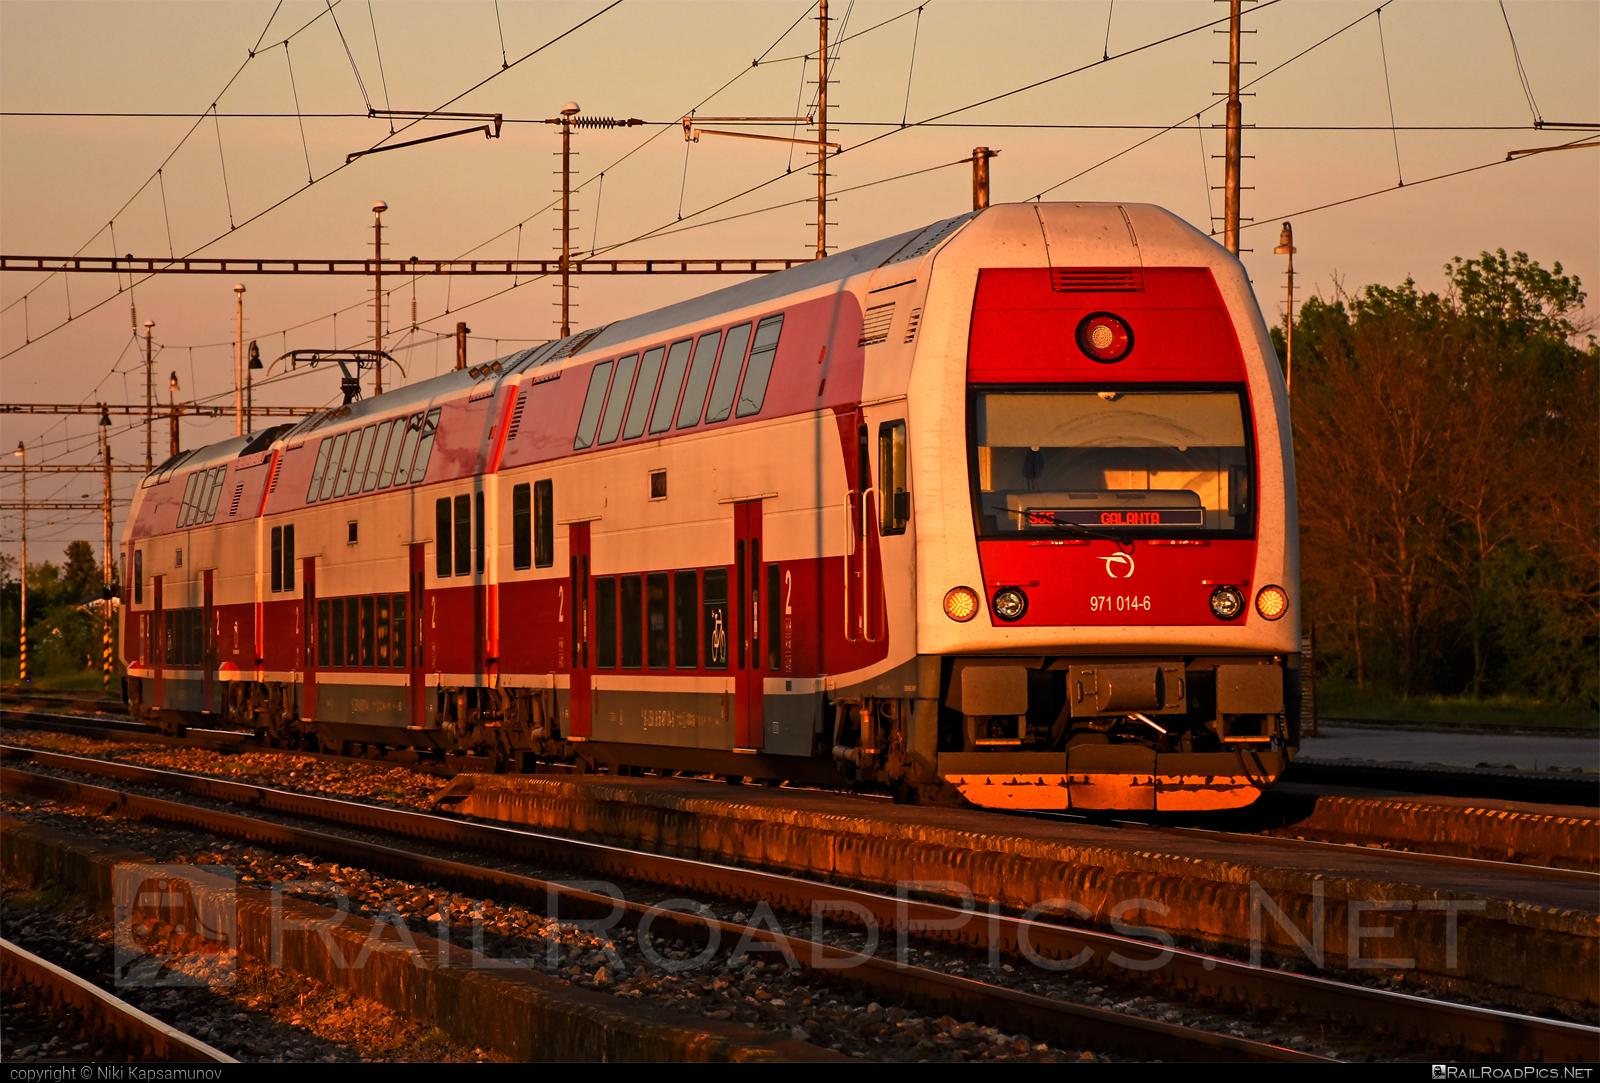 Škoda 4Ev - 971 014-6 operated by Železničná Spoločnost' Slovensko, a.s. #ZeleznicnaSpolocnostSlovensko #emu671 #skoda #skoda4ev #skodaclass671 #zssk